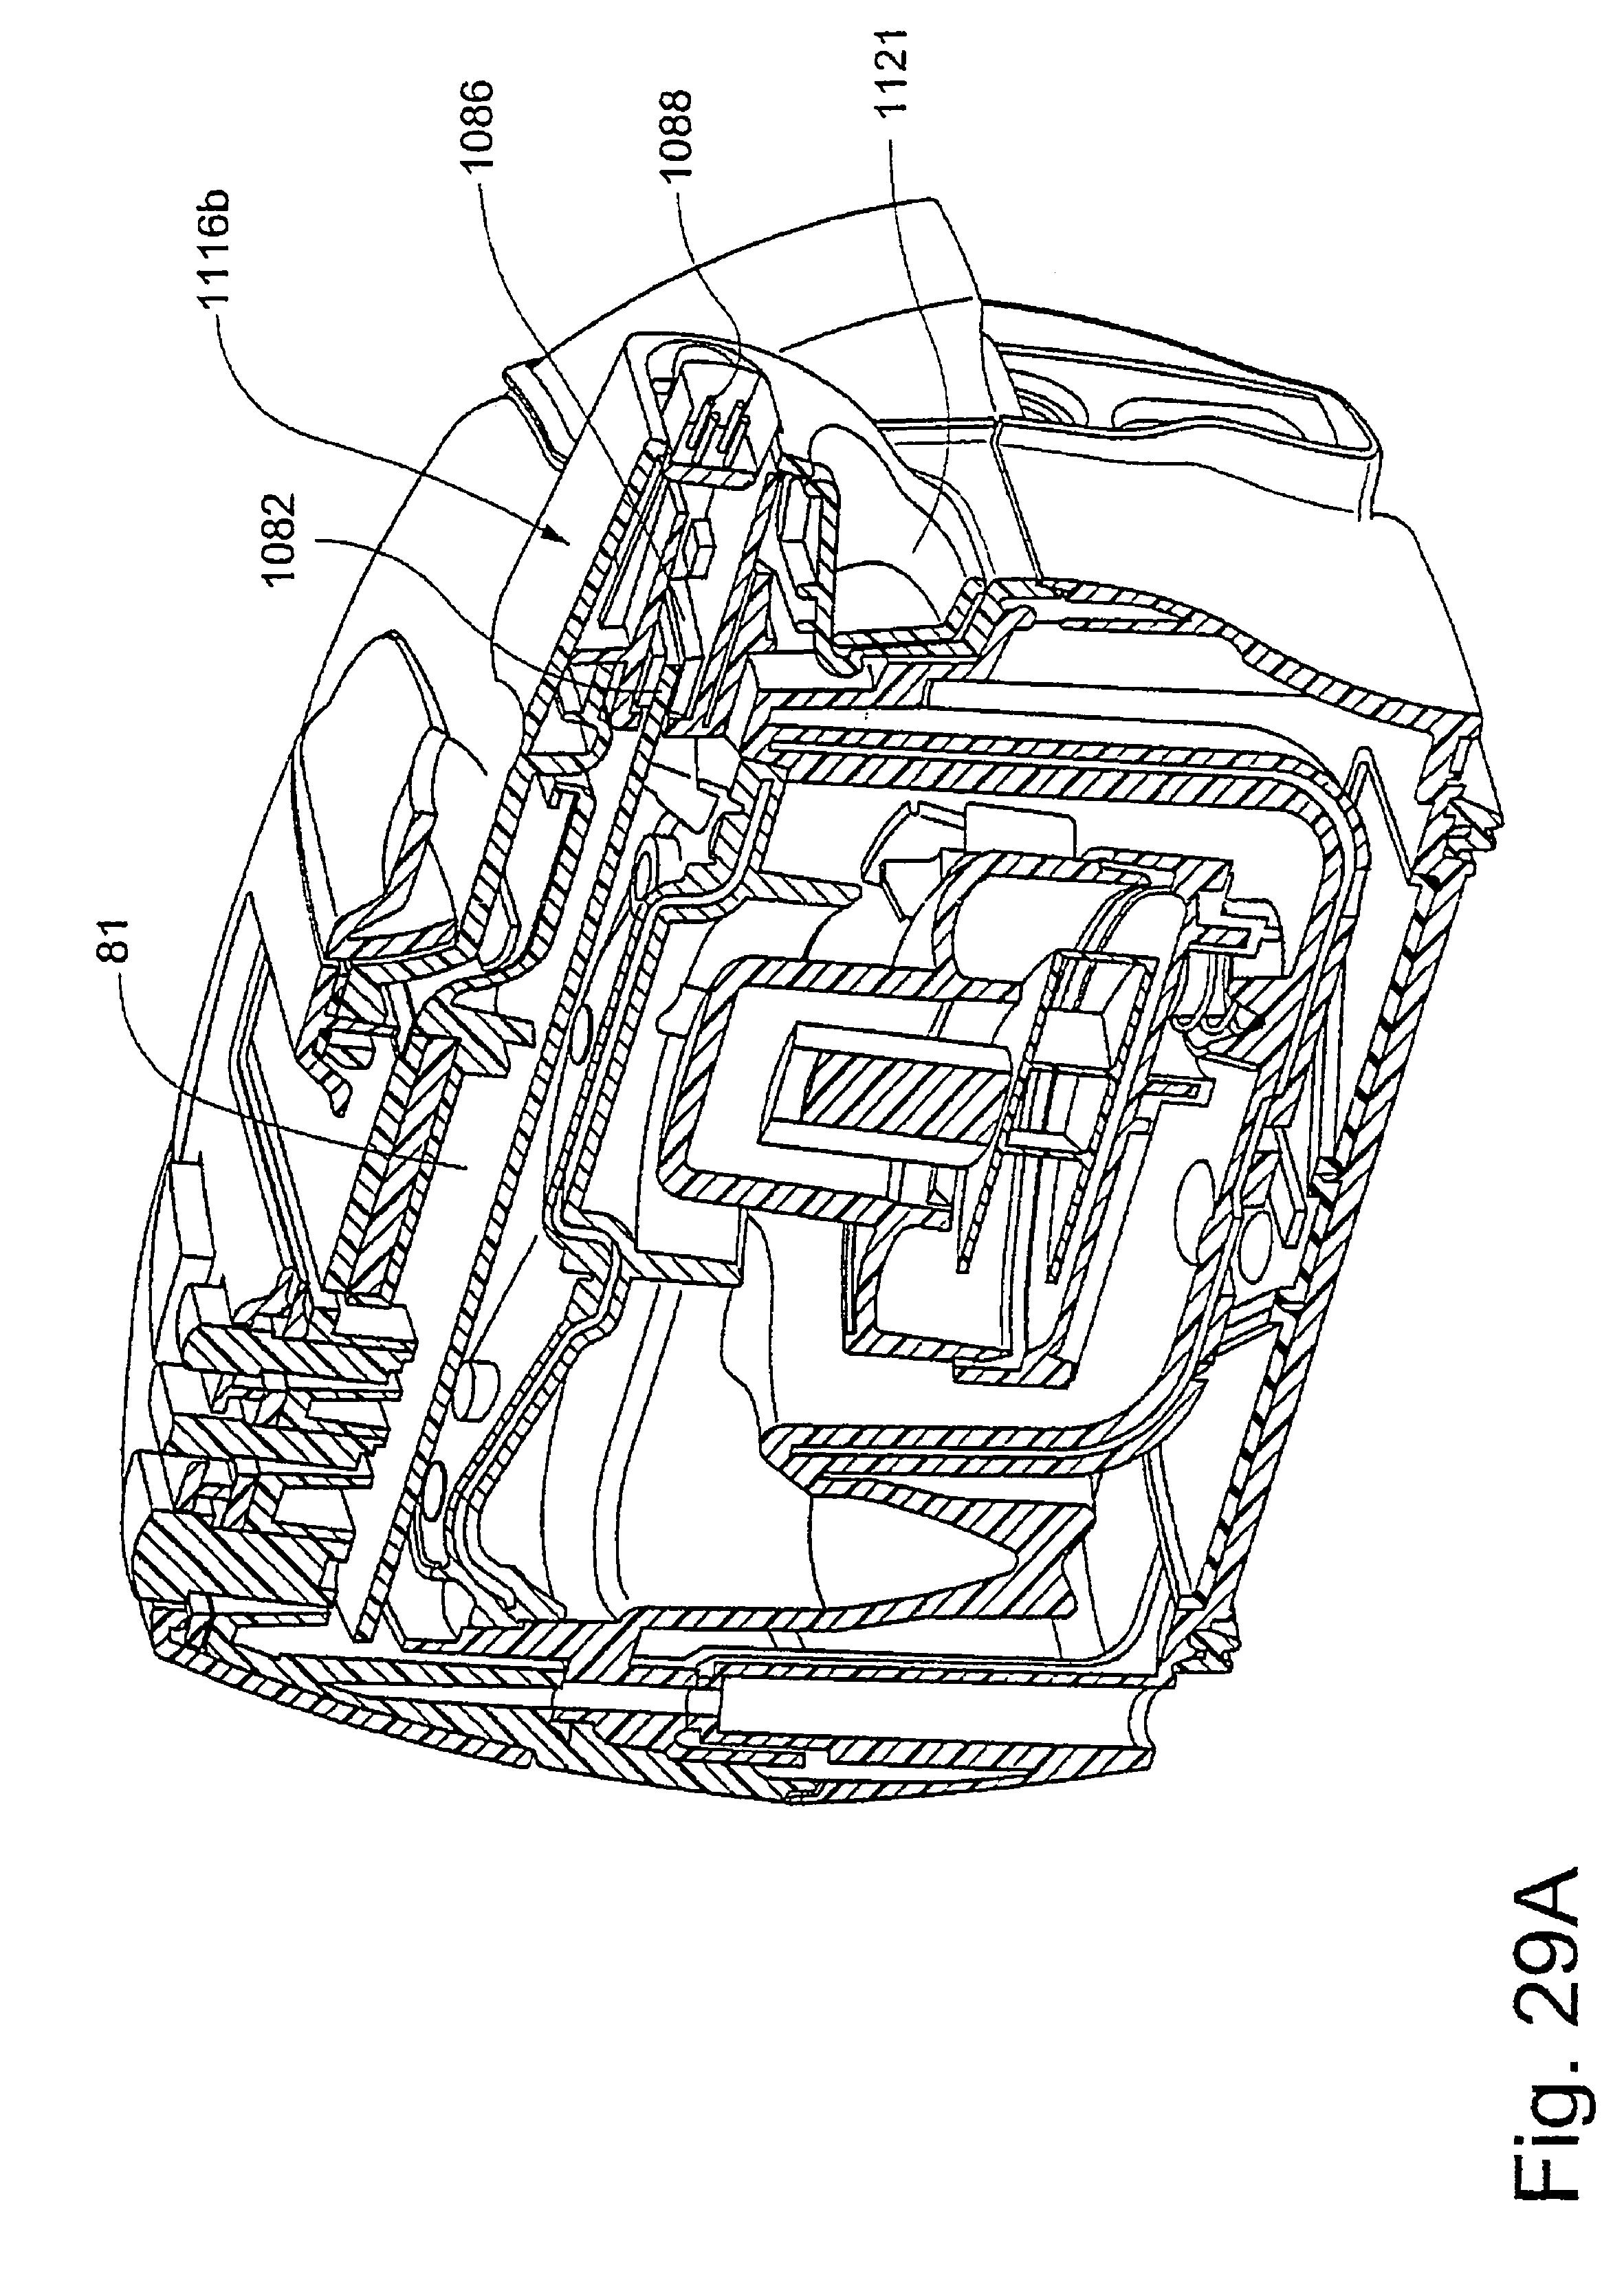 patent us 8,006,691 b2